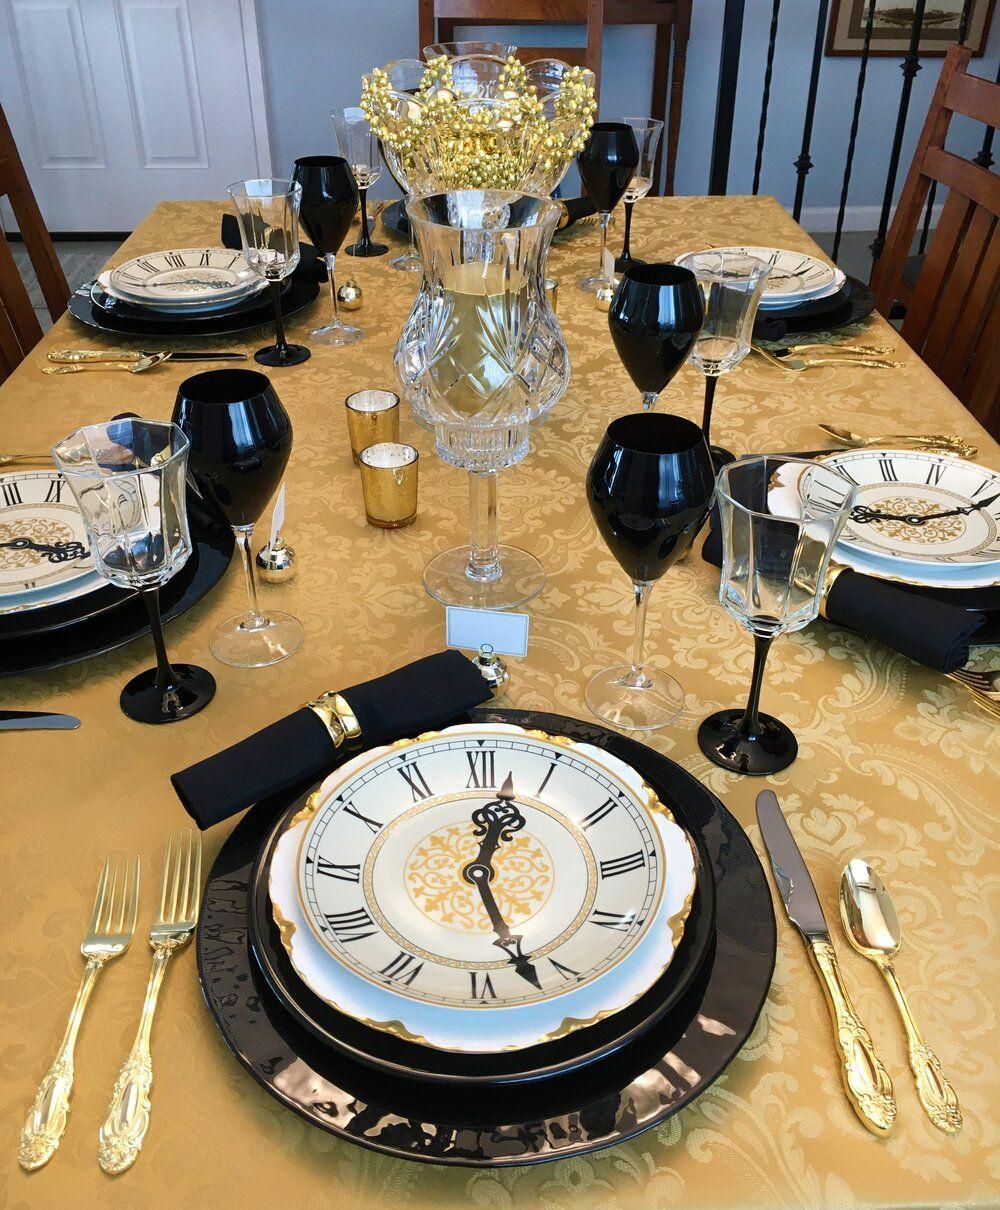 2019.12.31t.jpg in 2020 Gold table setting, Dinner table